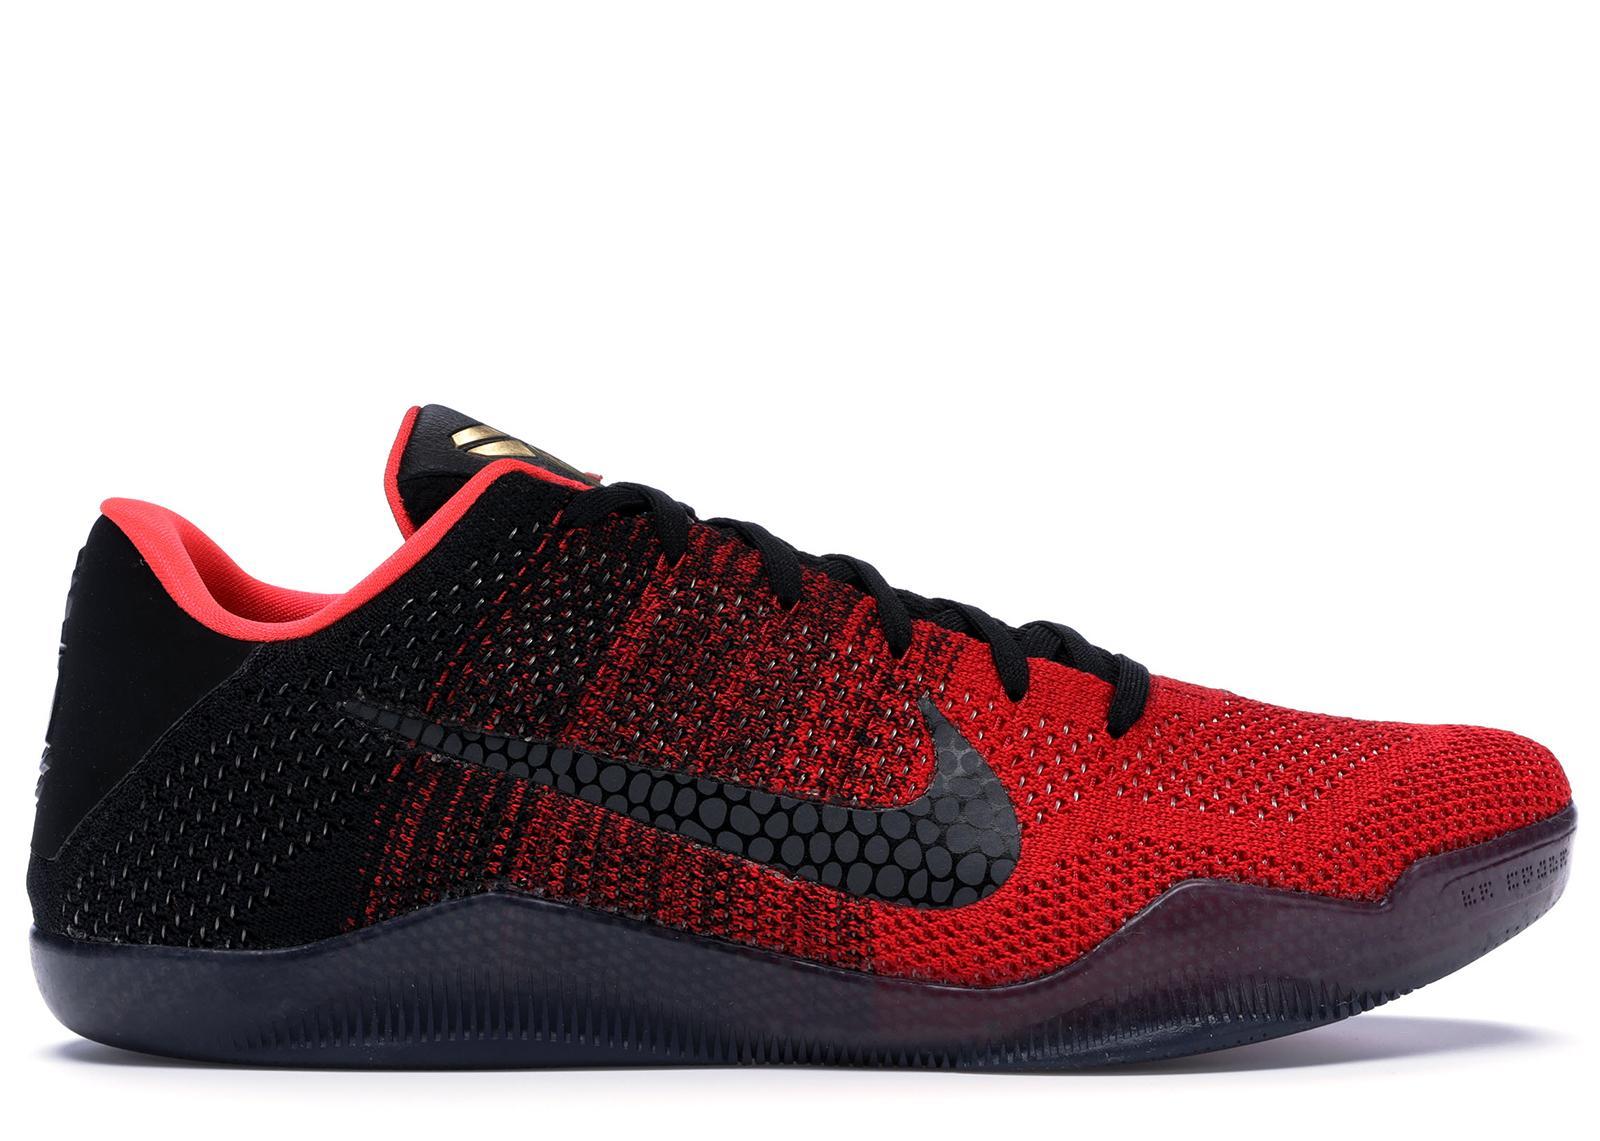 Nike Kobe 11 Elite Low Achilles Heel in